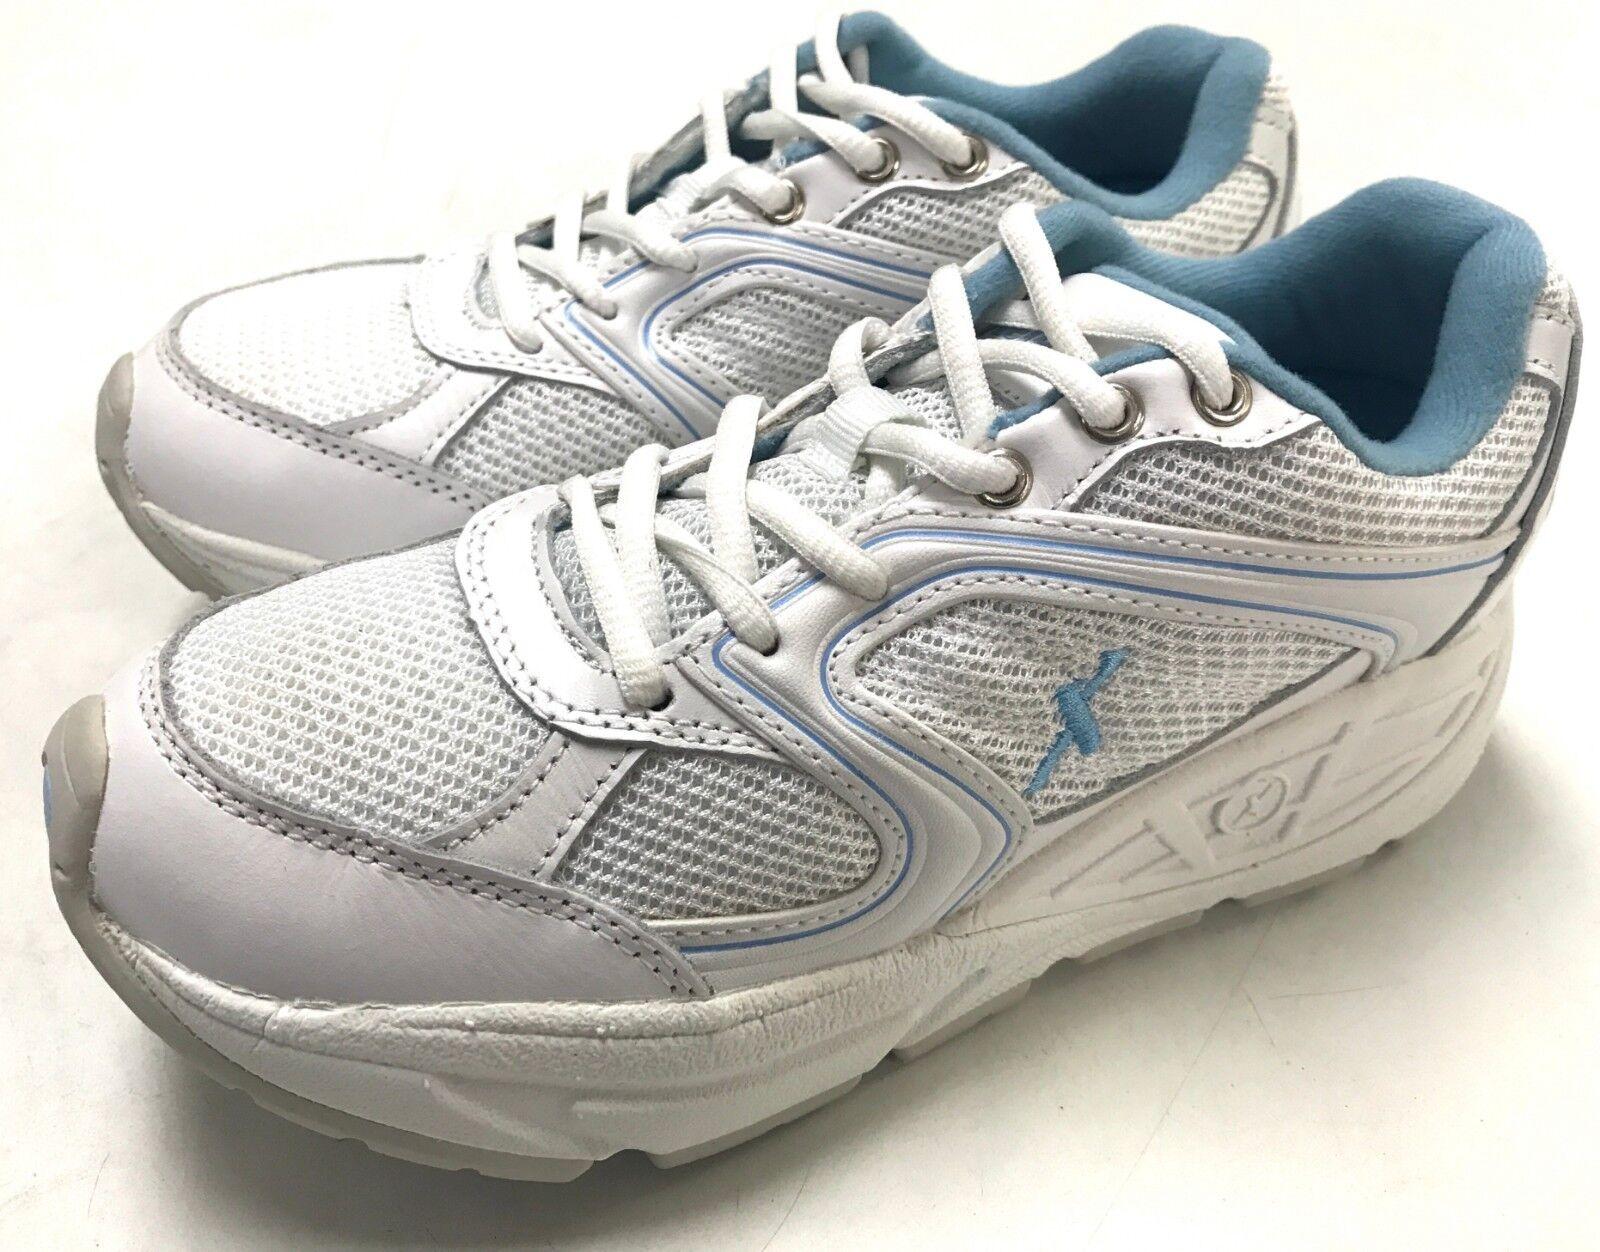 Damenschuhe Xelero Matrix 2 Mesh Comfort Therapeutic Extra Depth Walking Sneakers